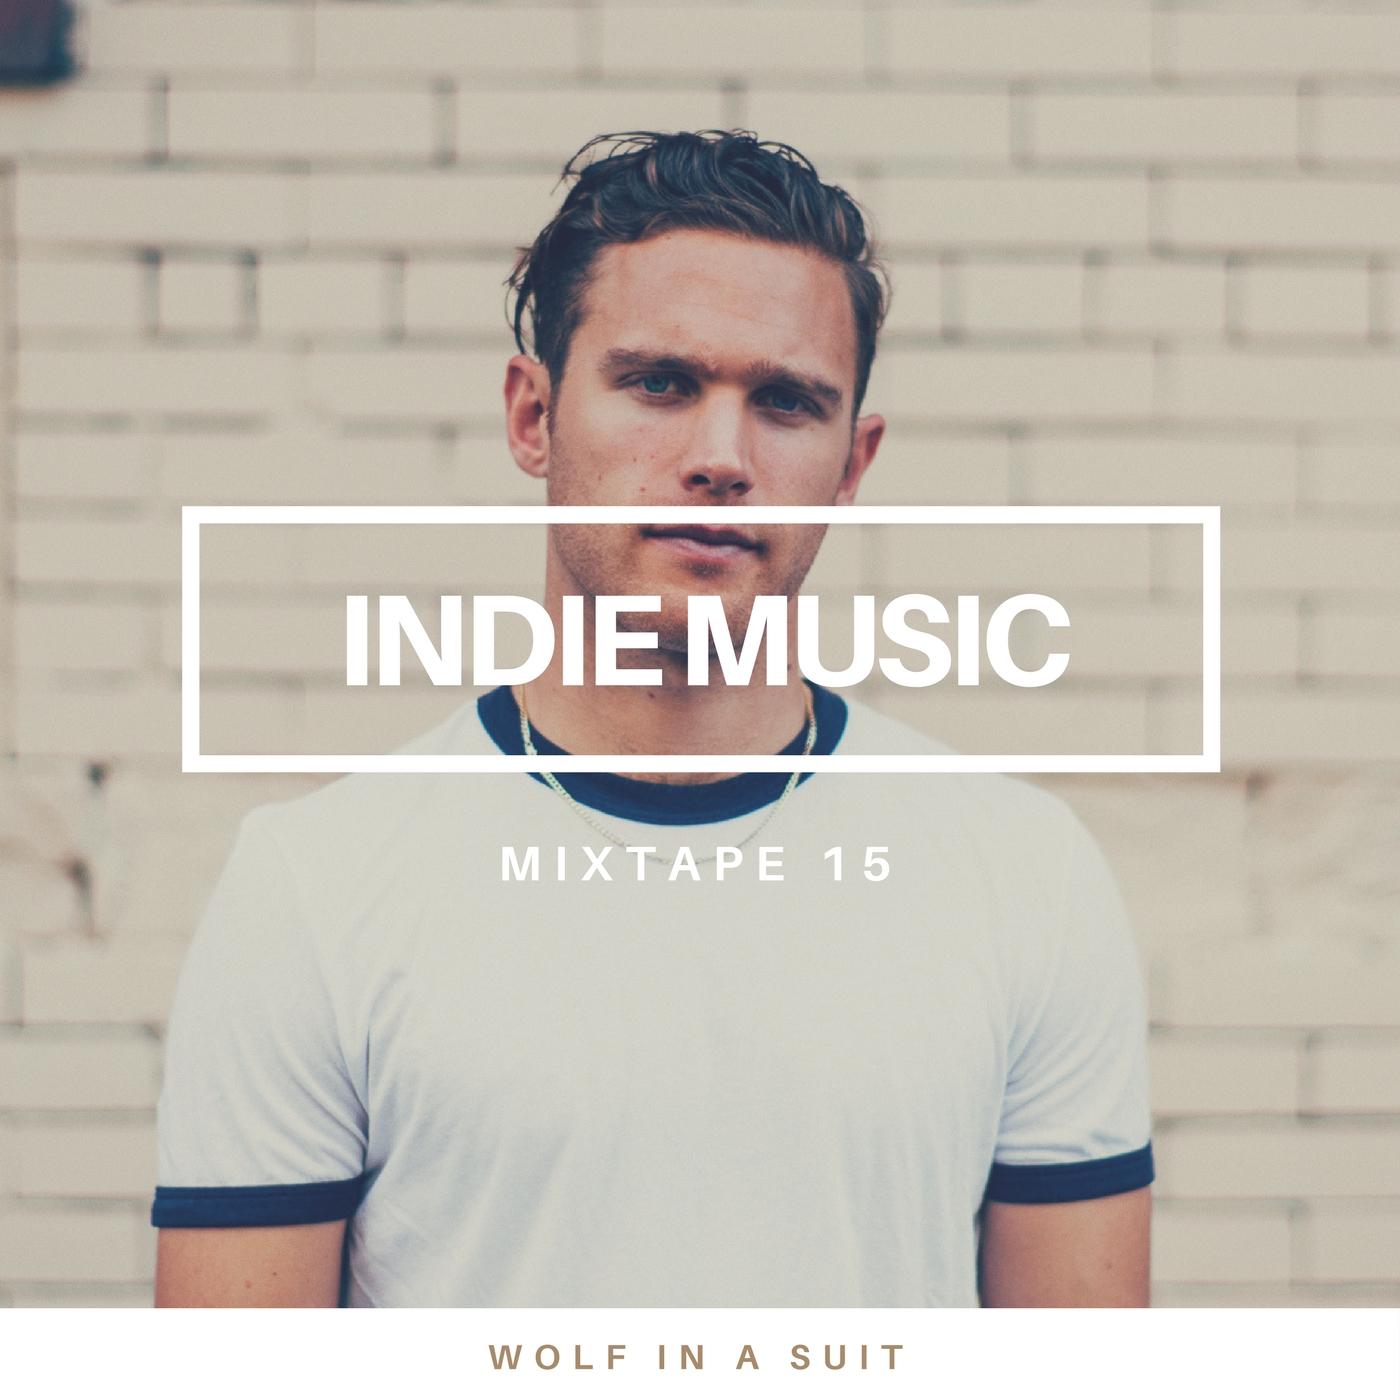 Indie Music Mixtape 15-indie music-indie pop-indie rock-new music-playlist-music blog-electronica-indie blog-wolfinasuit-wolf in a suit